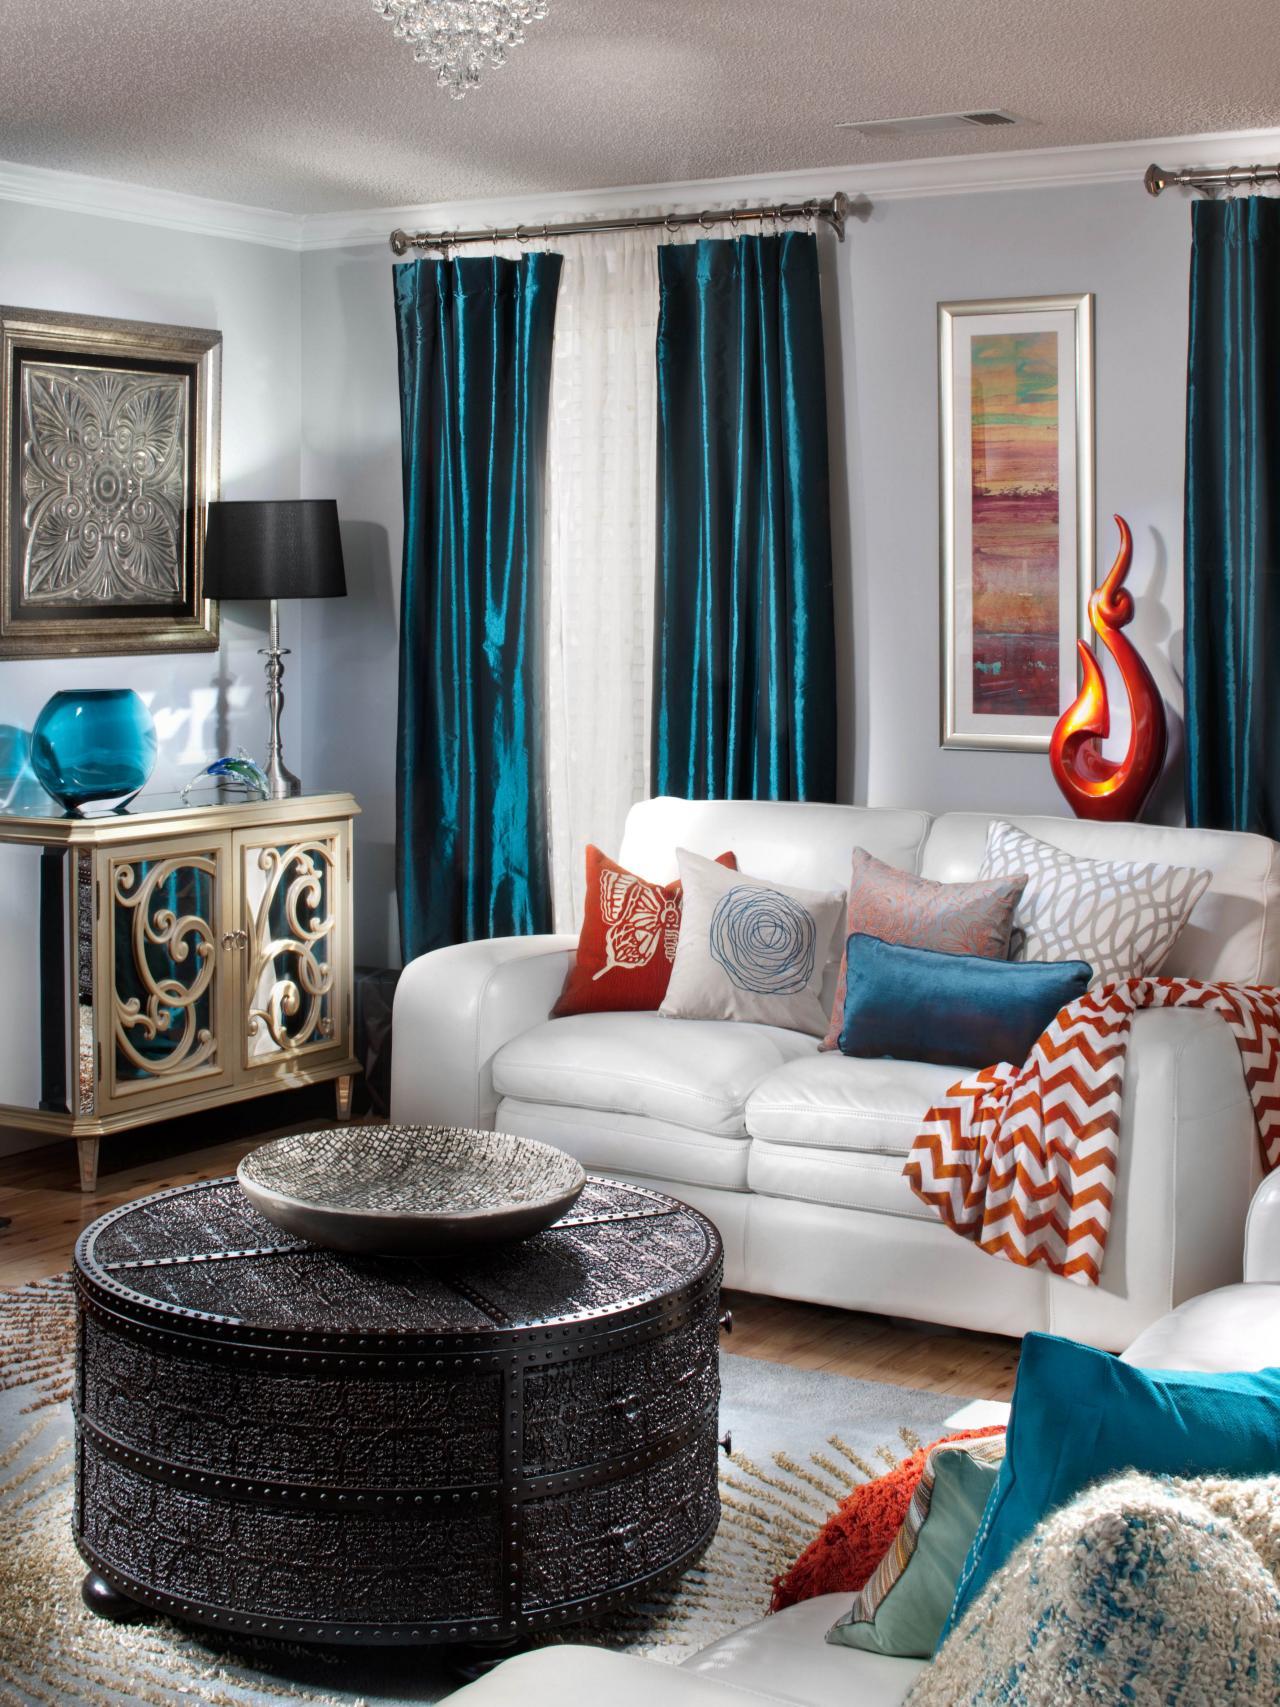 25 Teal Living Room Design Ideas - Decoration Love